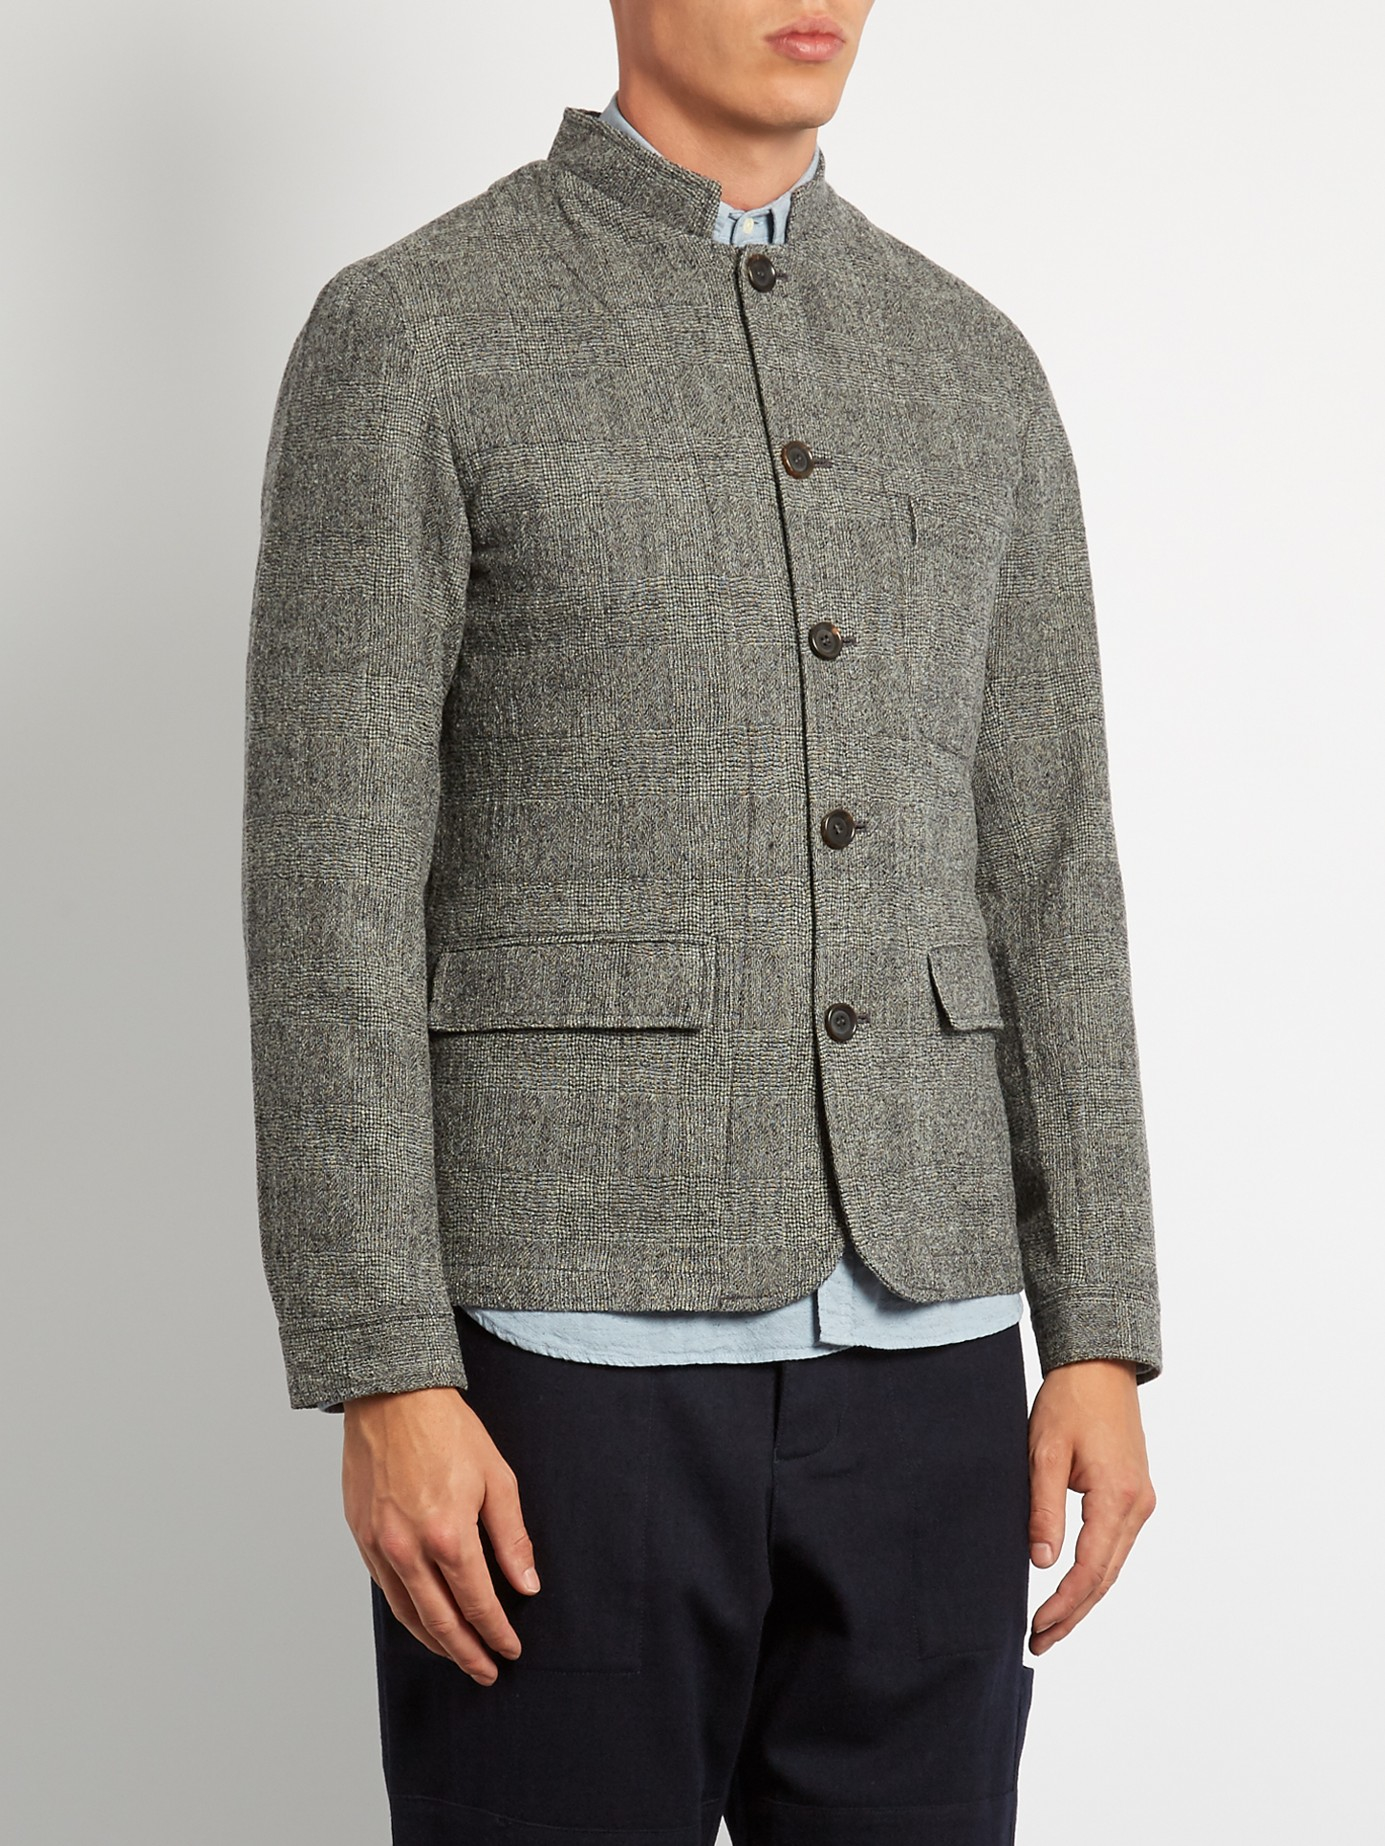 Oliver Spencer Coram Dudley Mandarin-collar Wool Jacket in Grey (Grey) for Men